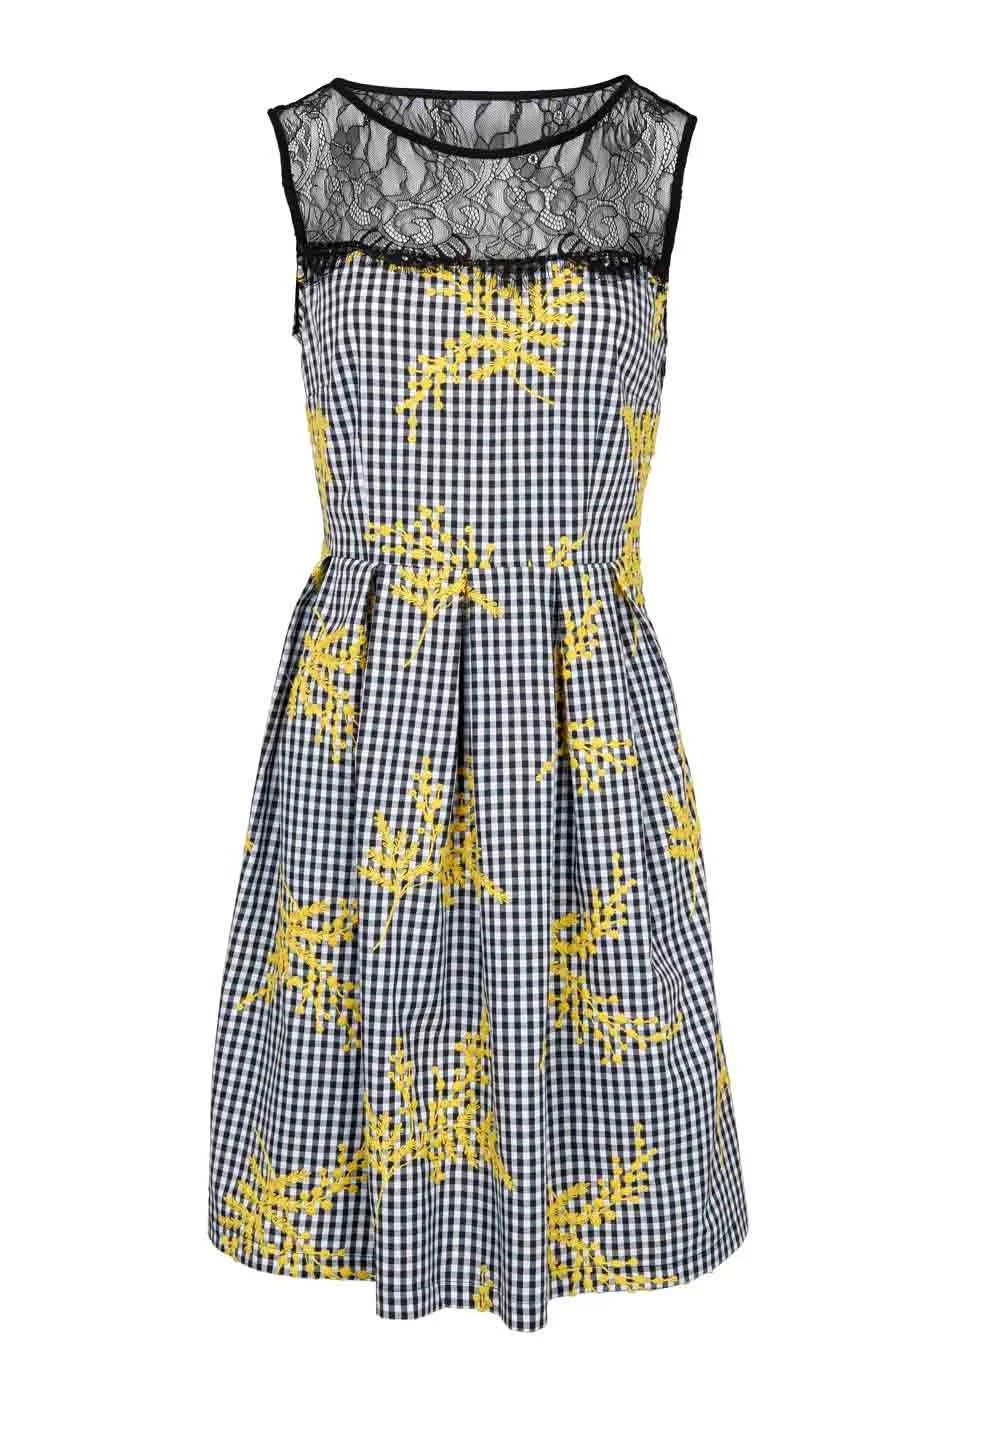 303.683 RICK CARDONA Damen Designer-Kleid m. Spitze Schwarz-Gelb